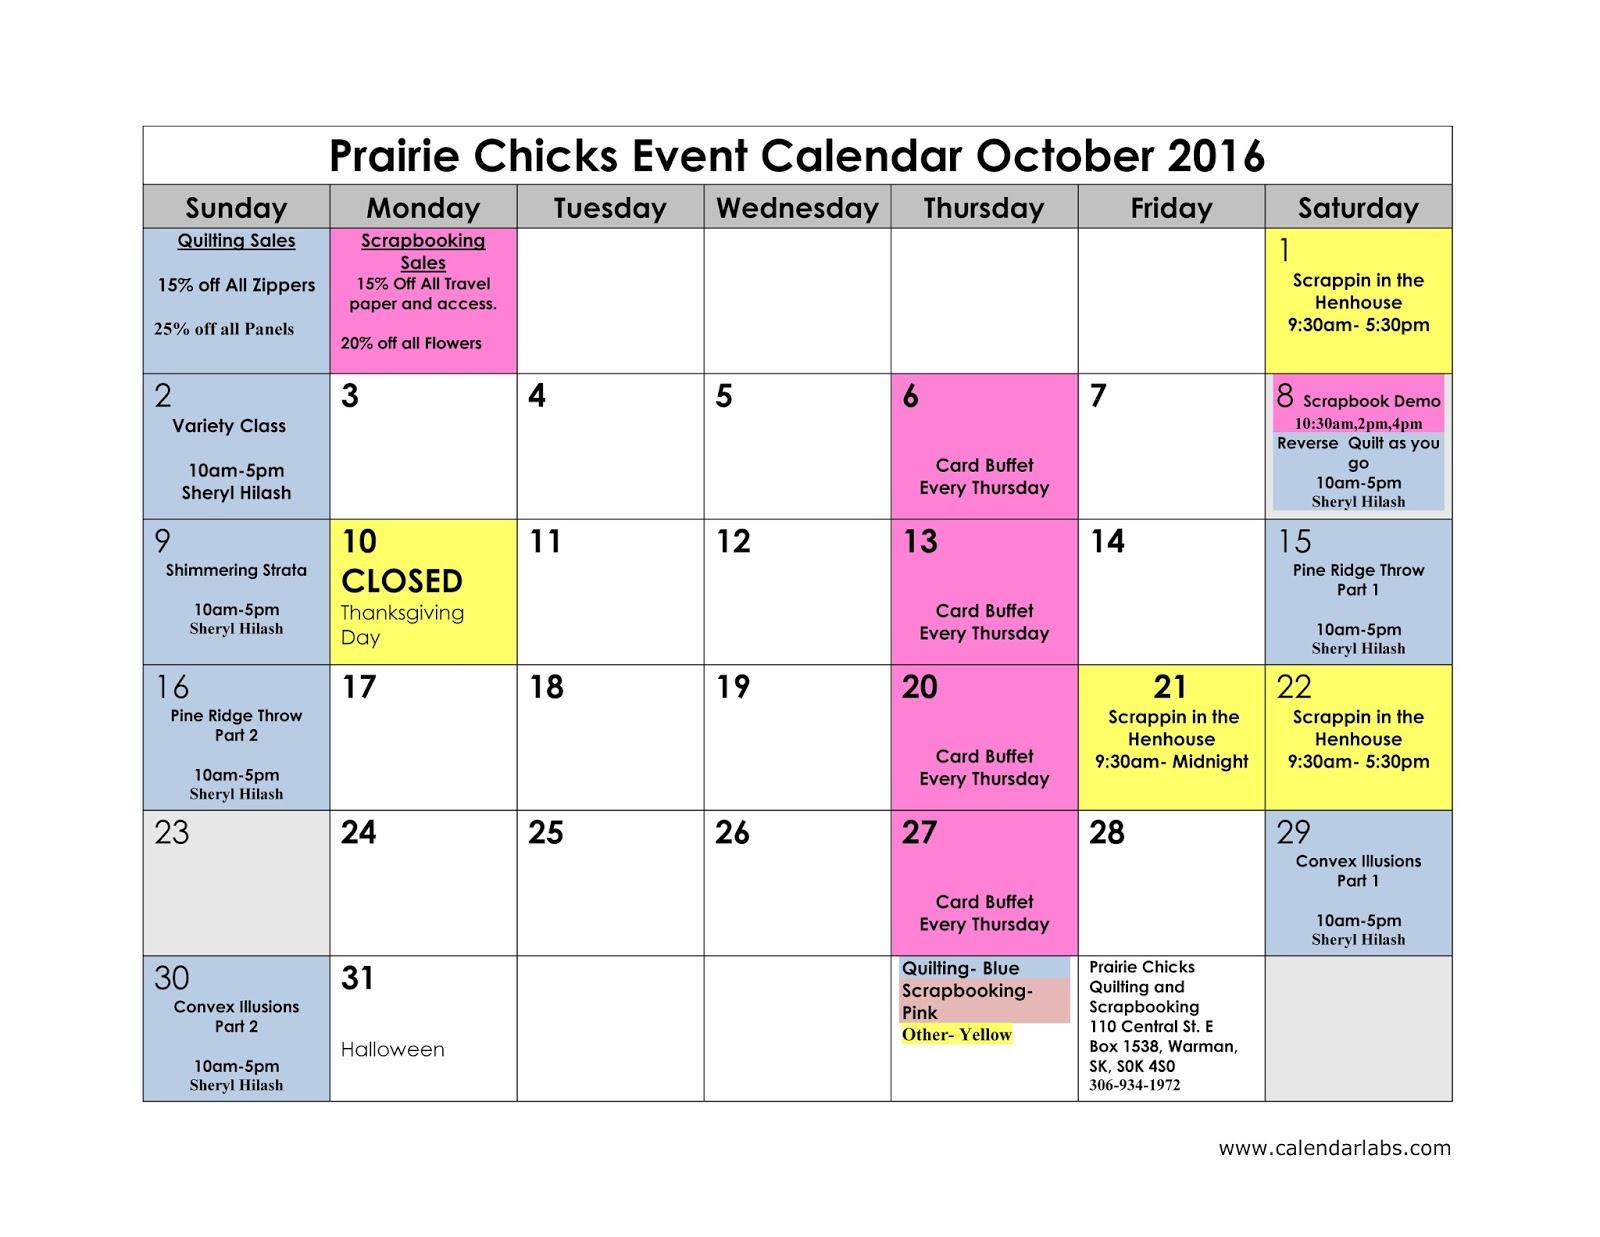 Event Calendar 2016 : Prairie chicks october event calendar and a few new